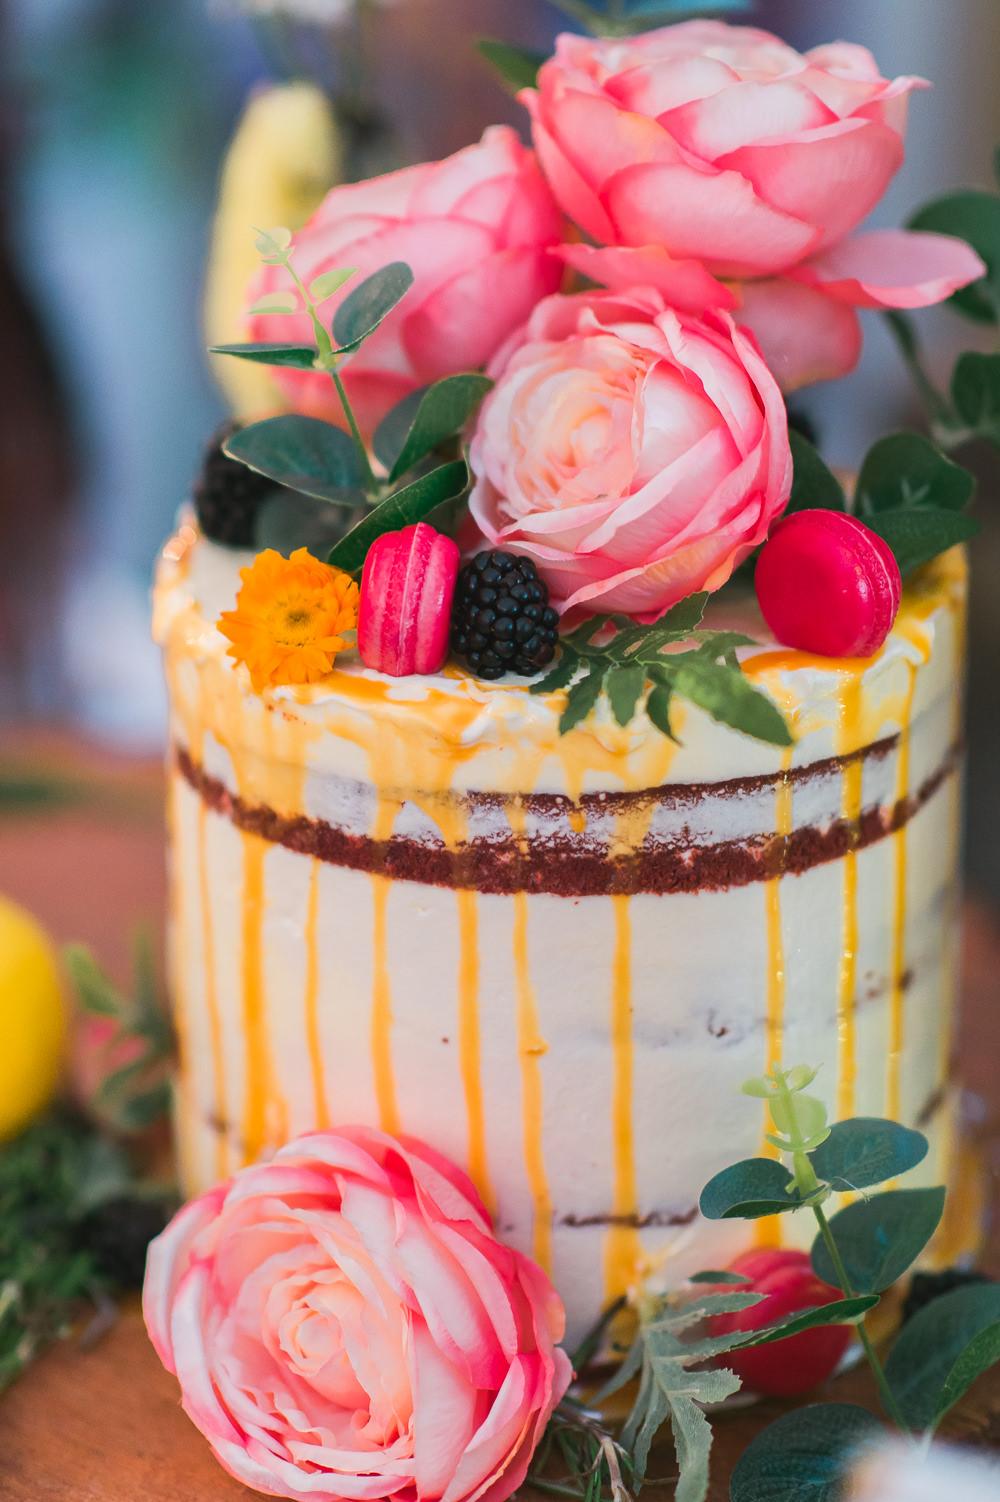 Semi Naked Cake Drip Macarons Berries David Austin Roses Fruit Space Hull Warehouse Wedding M&G Photographic